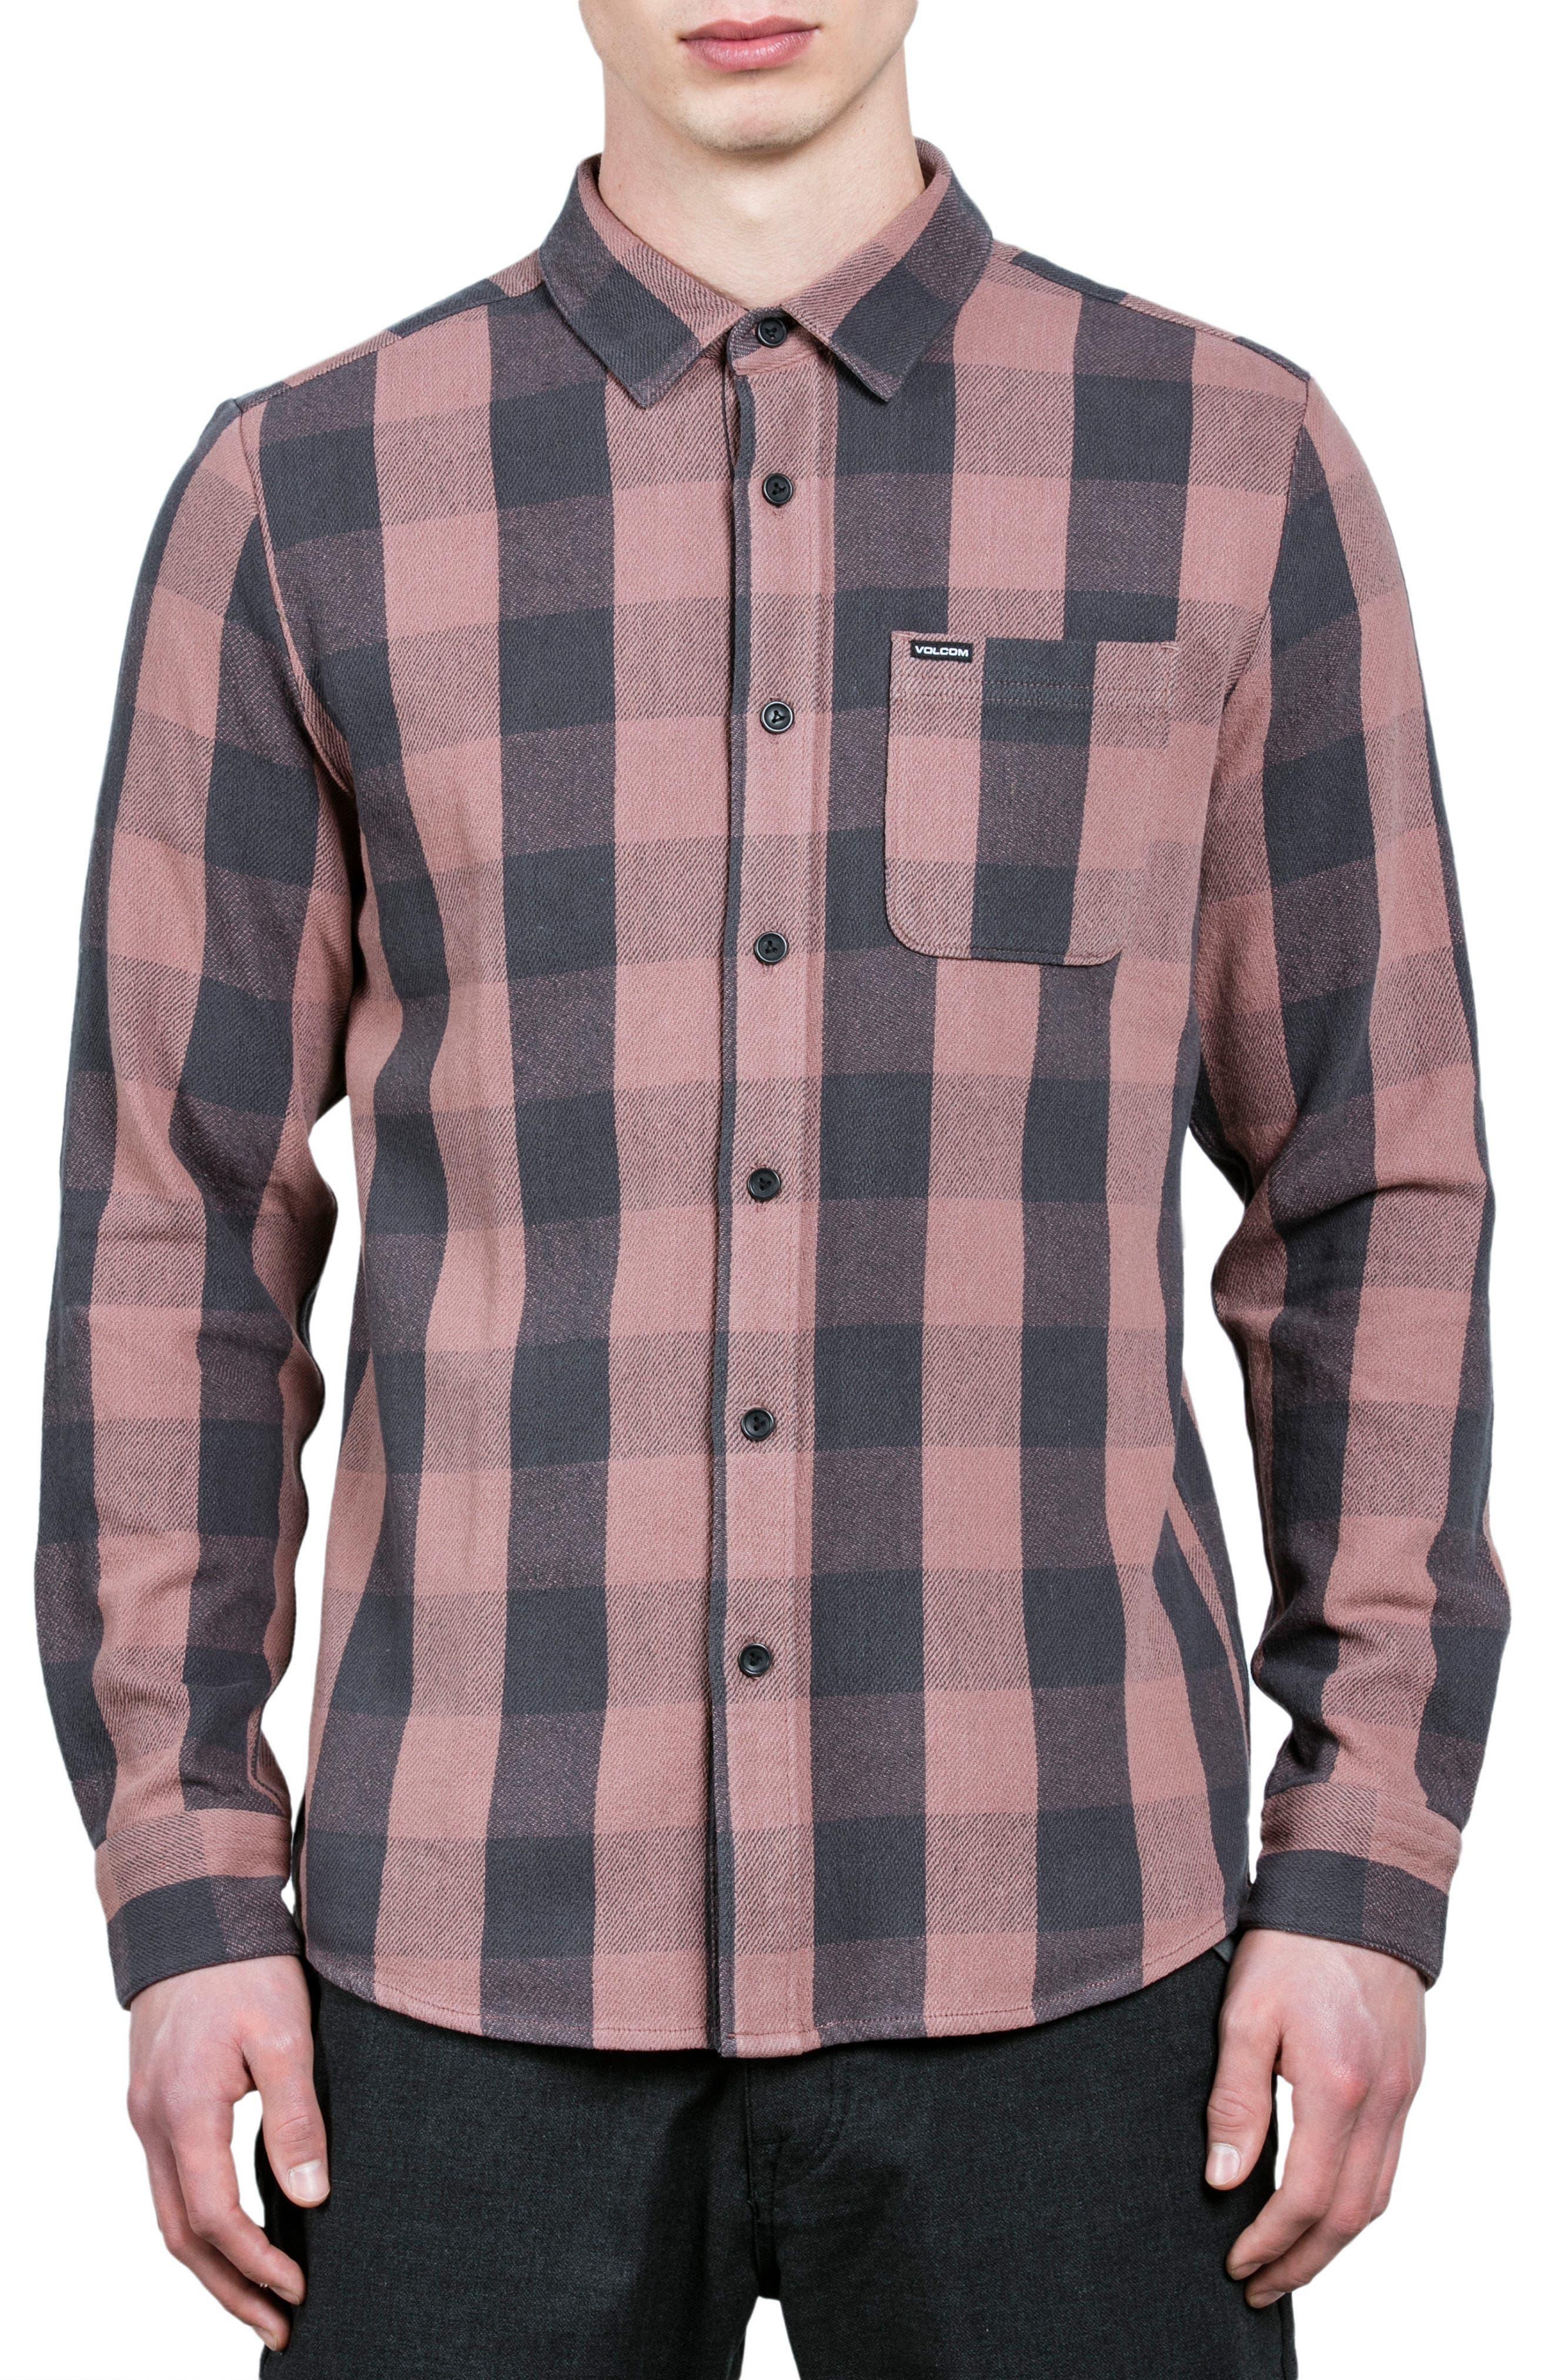 Invert Check Flannel Shirt,                             Main thumbnail 1, color,                             Brown